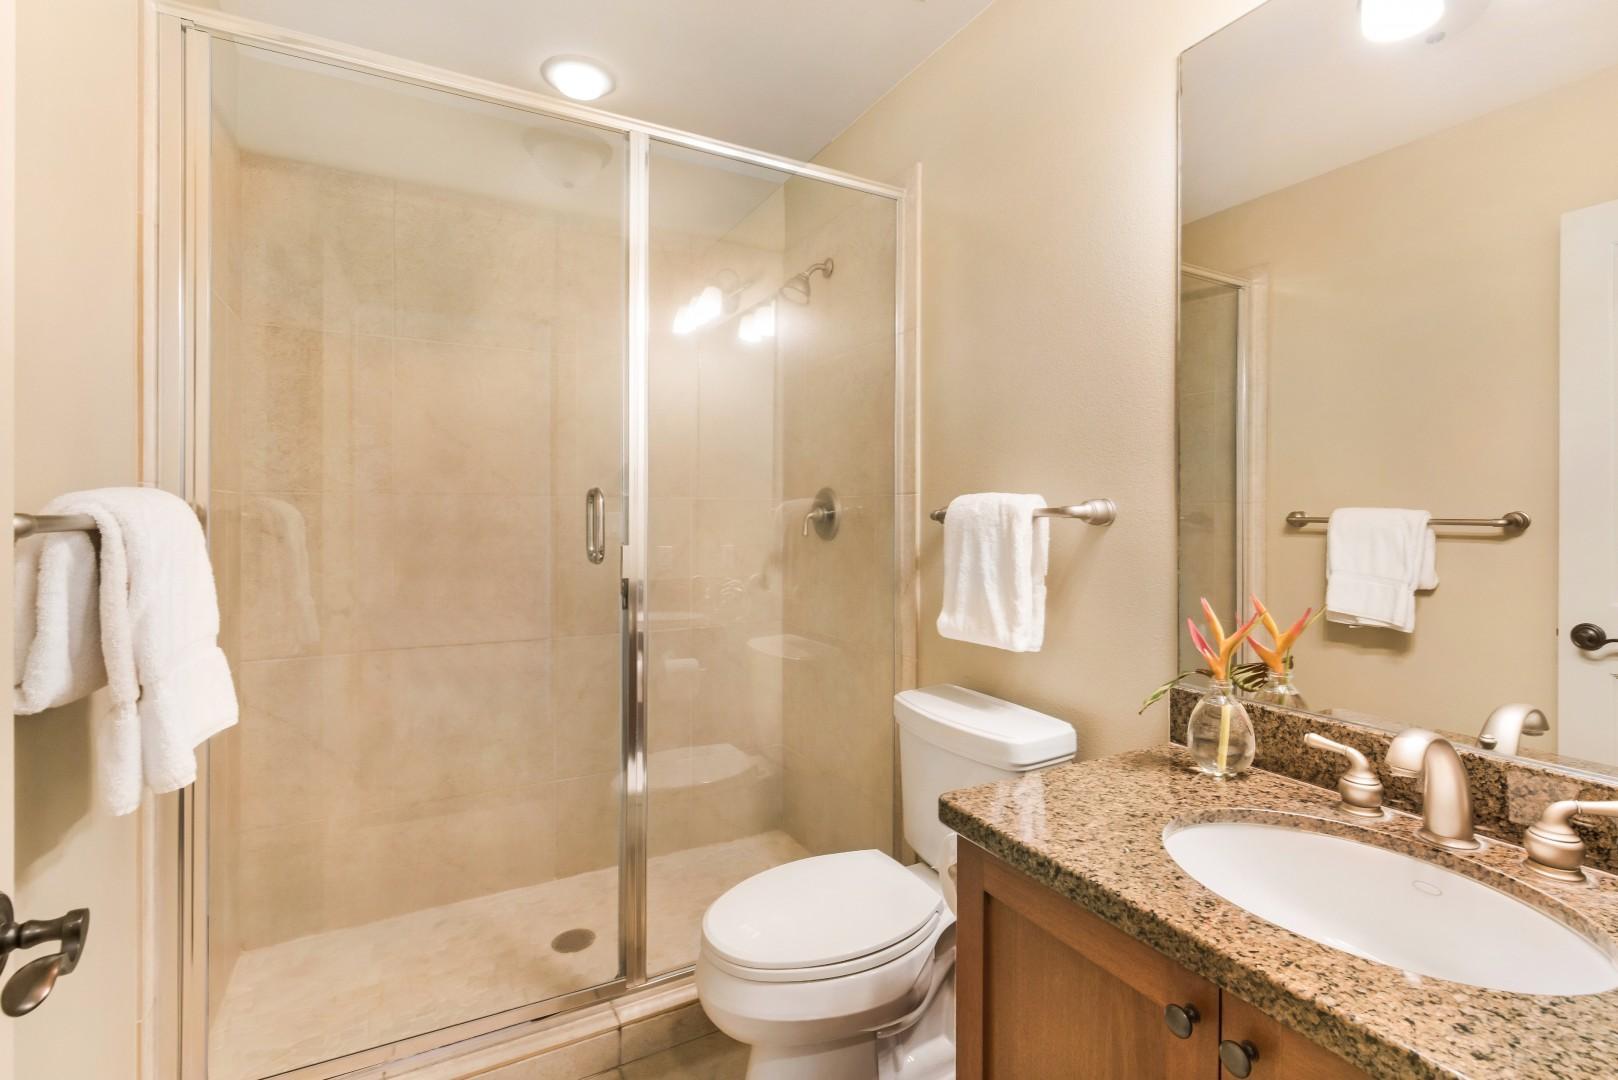 Upstairs guest bathroom, adjacent to bedroom 2